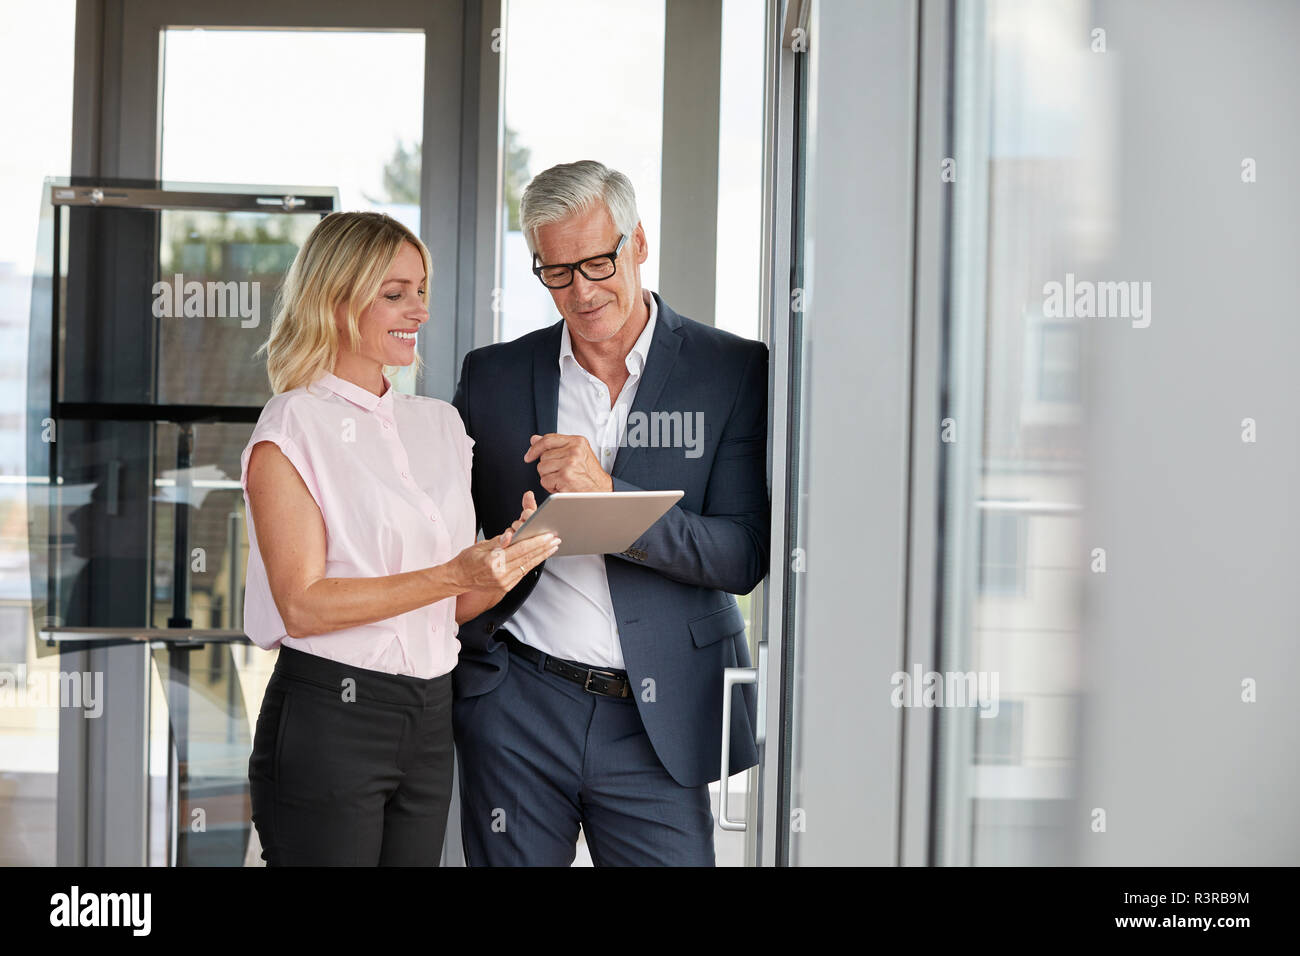 Kaufmann und Frau im Büro, diskutieren Projekt, digitale tabet Stockfoto